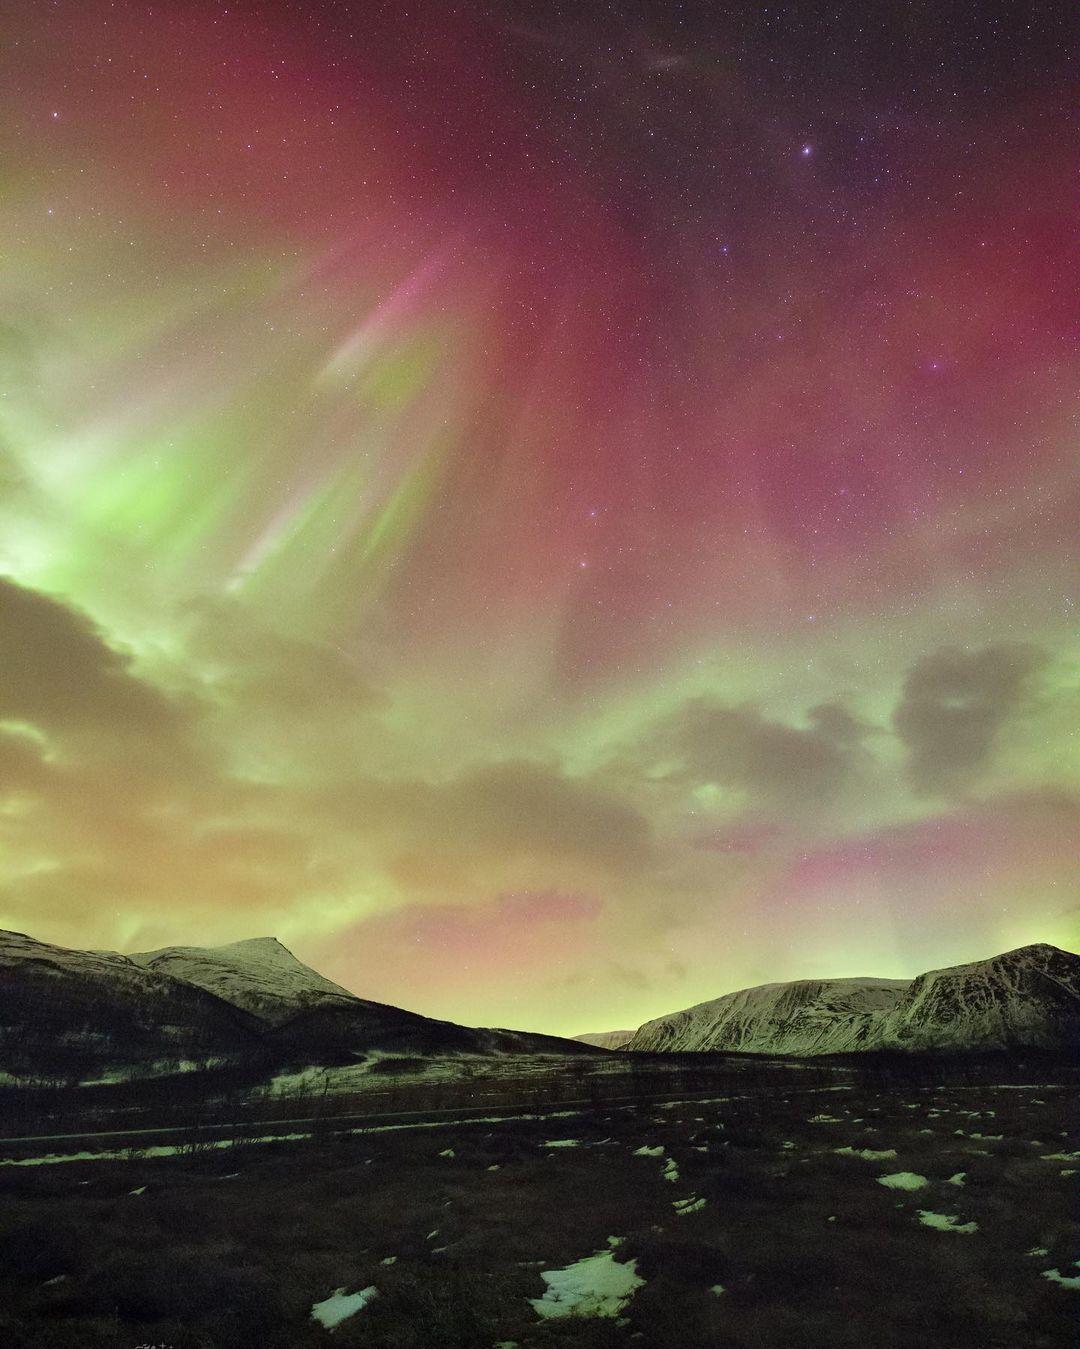 Красота ночного неба на снимках Адриена Луи Модуита